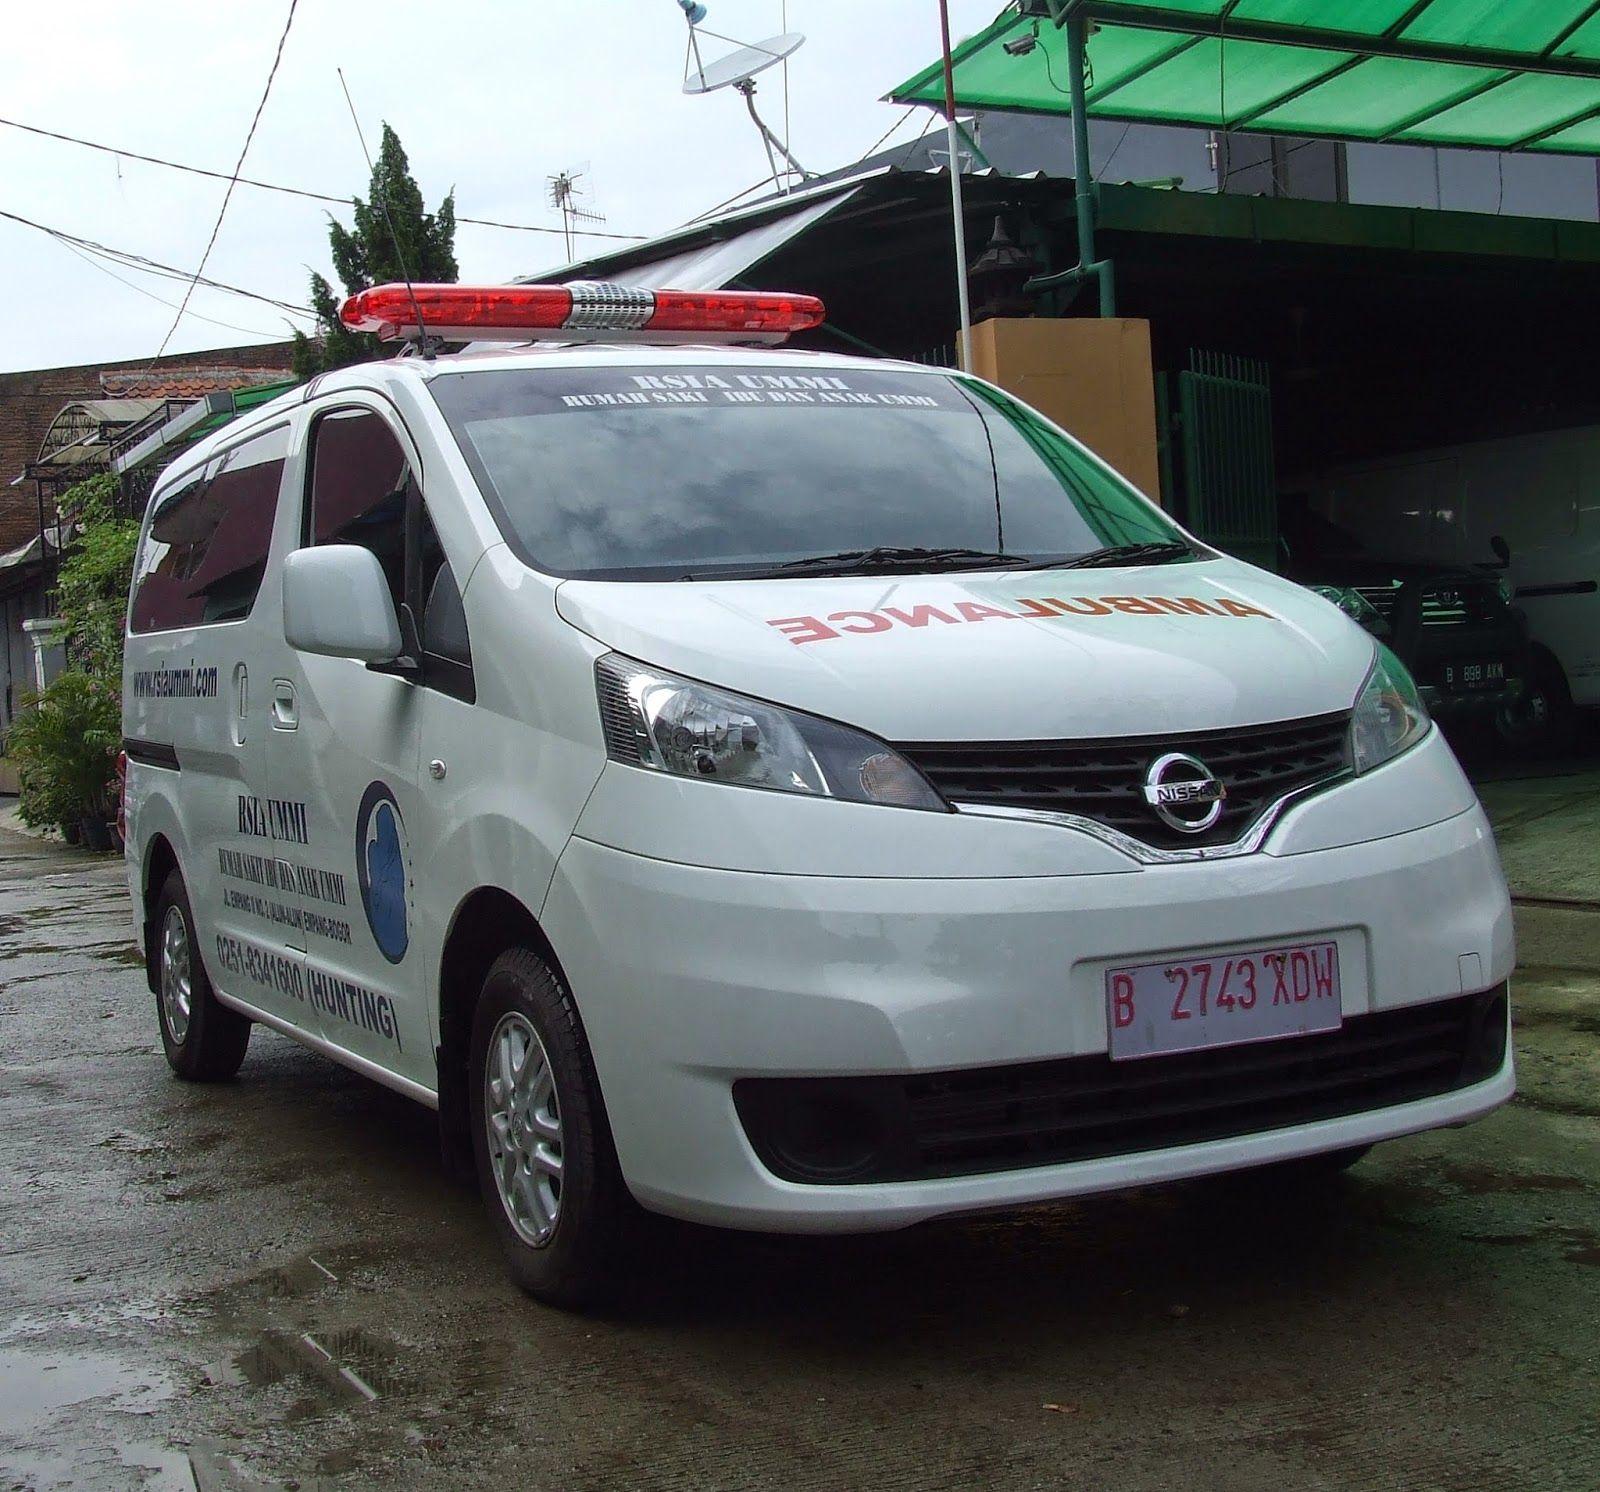 Showroom Mobil Ambulan Ambulance Pasien Evalia 081284074126 Ambulans Mobil